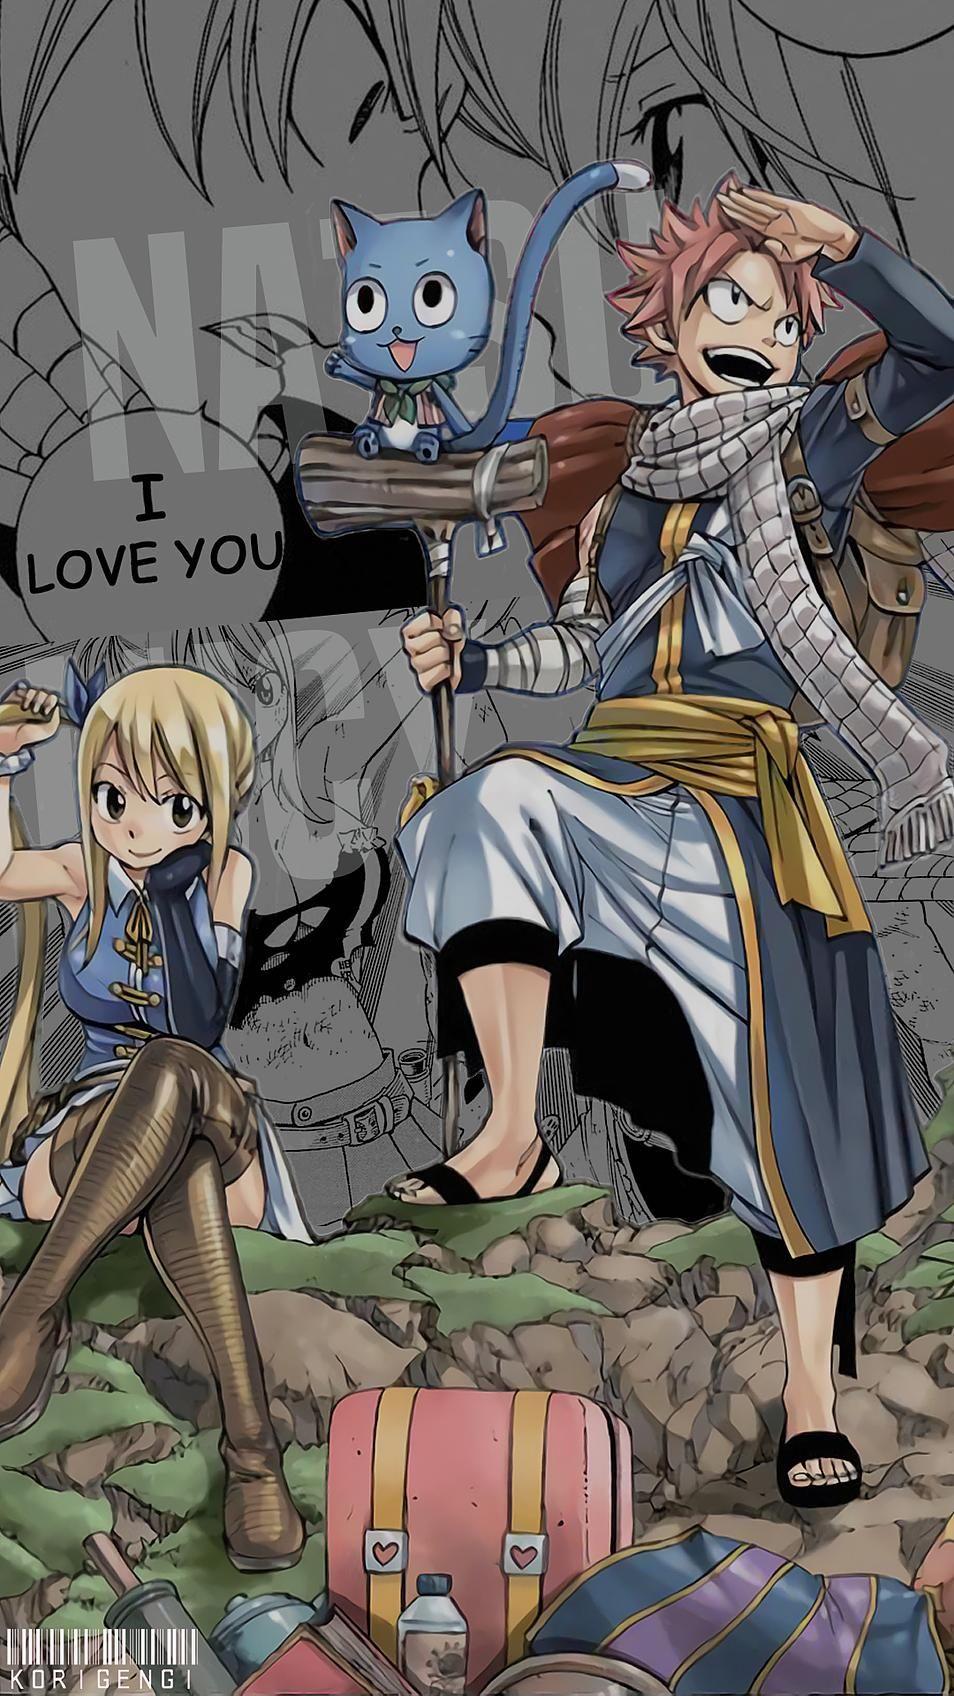 Natsu X Lucy Korigengi Wallpaper Anime Fairy Tail Art Fairy Tail Family Fairy Tail Ships